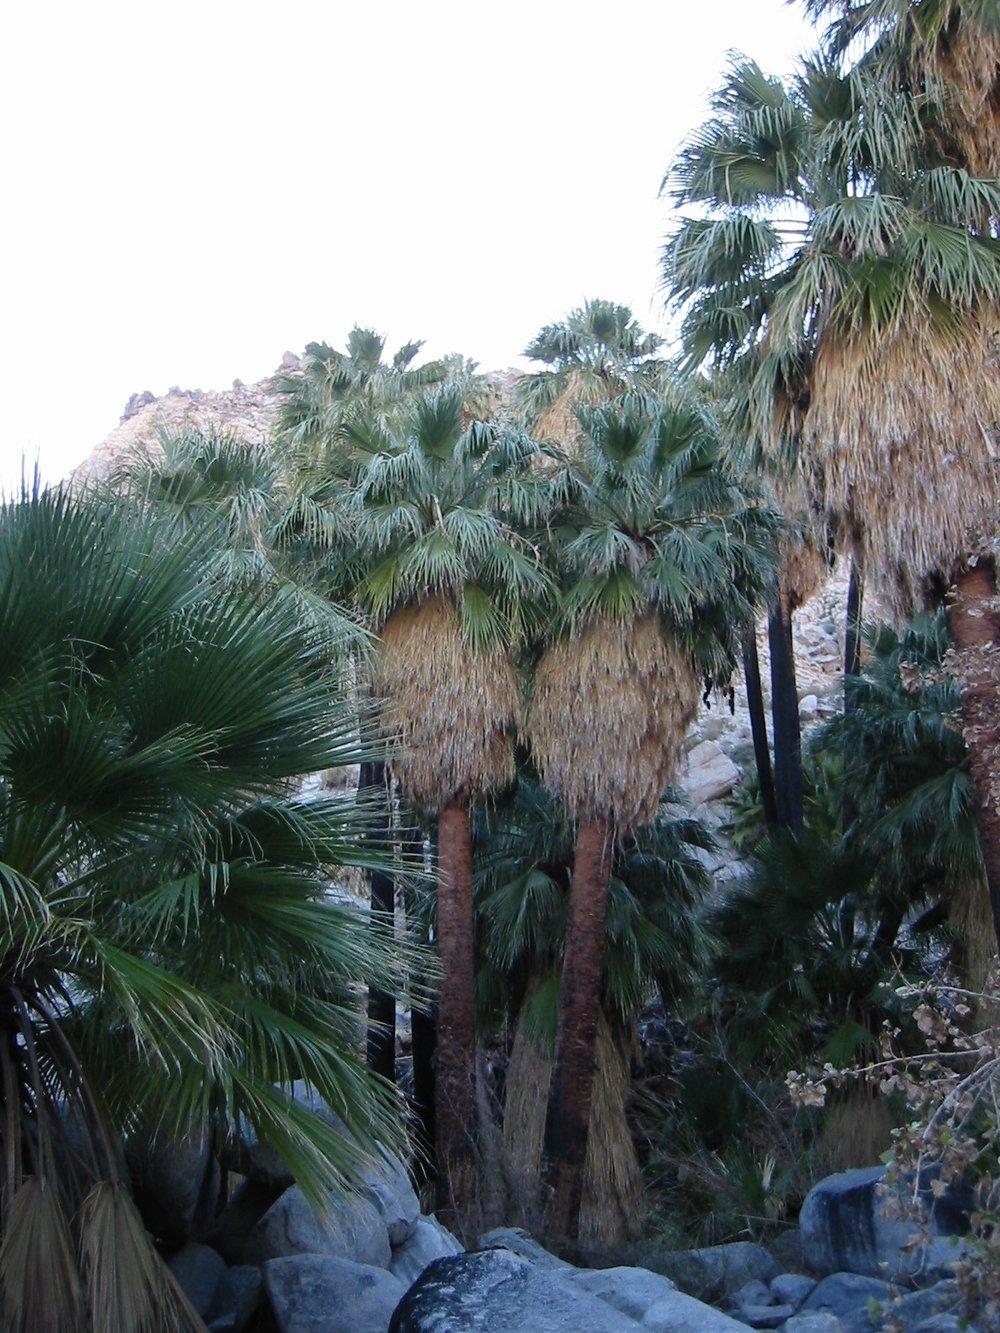 California Fan Palm ( Washingtonia filifera ) anonymous,  Washingtonia filifera ,  CC BY-SA 1.0